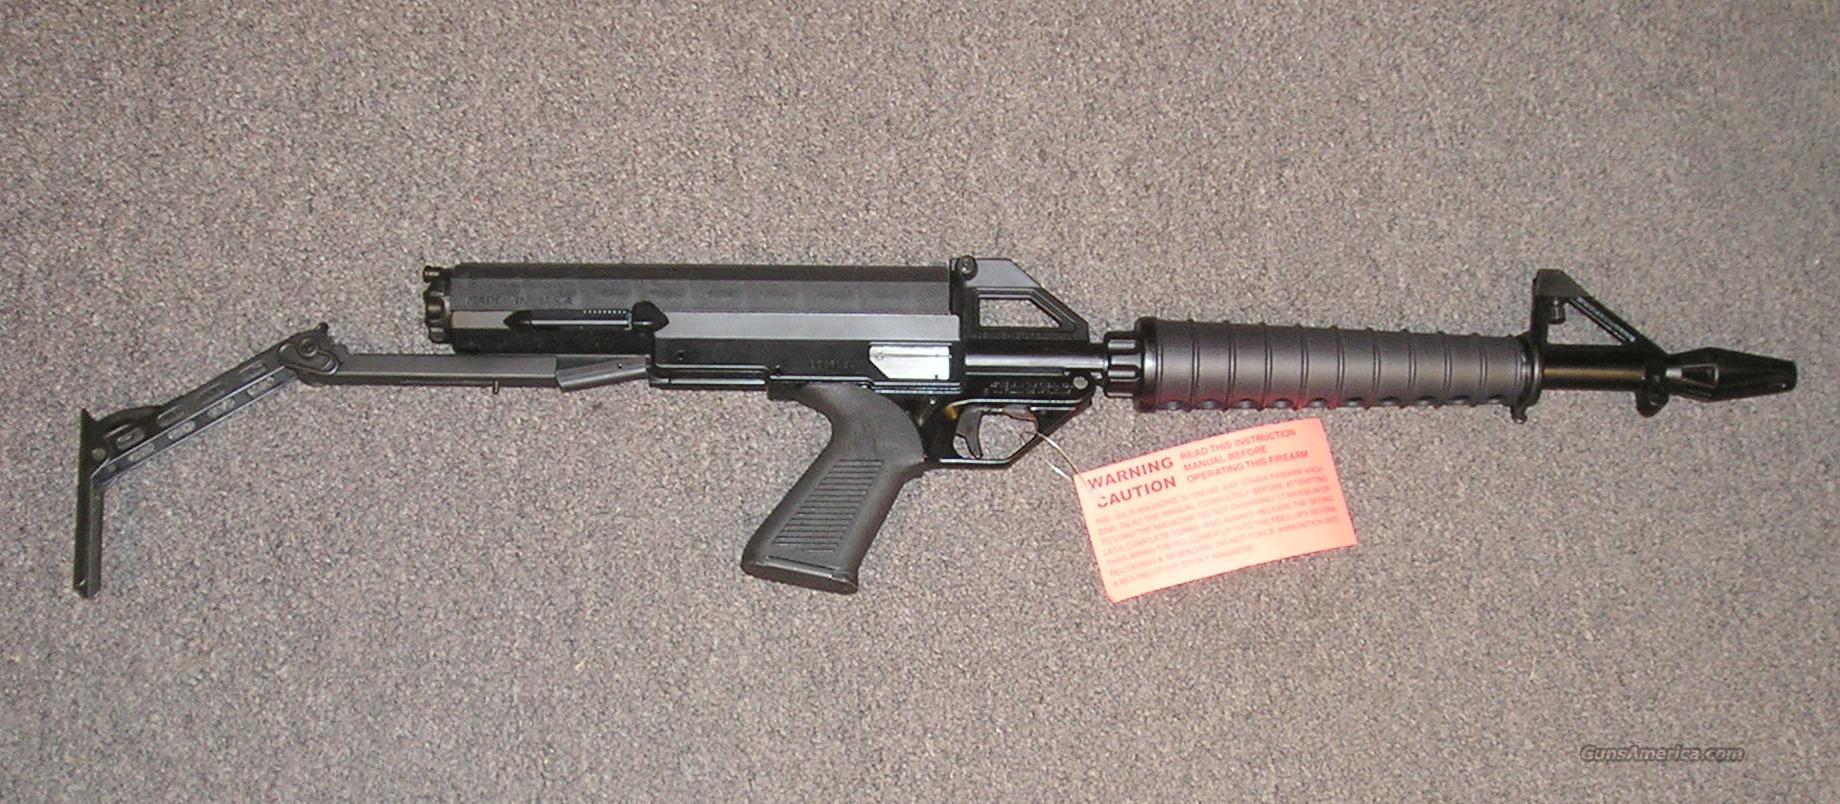 Calico M100 22 Long Rifle HI-CAP - YouTube